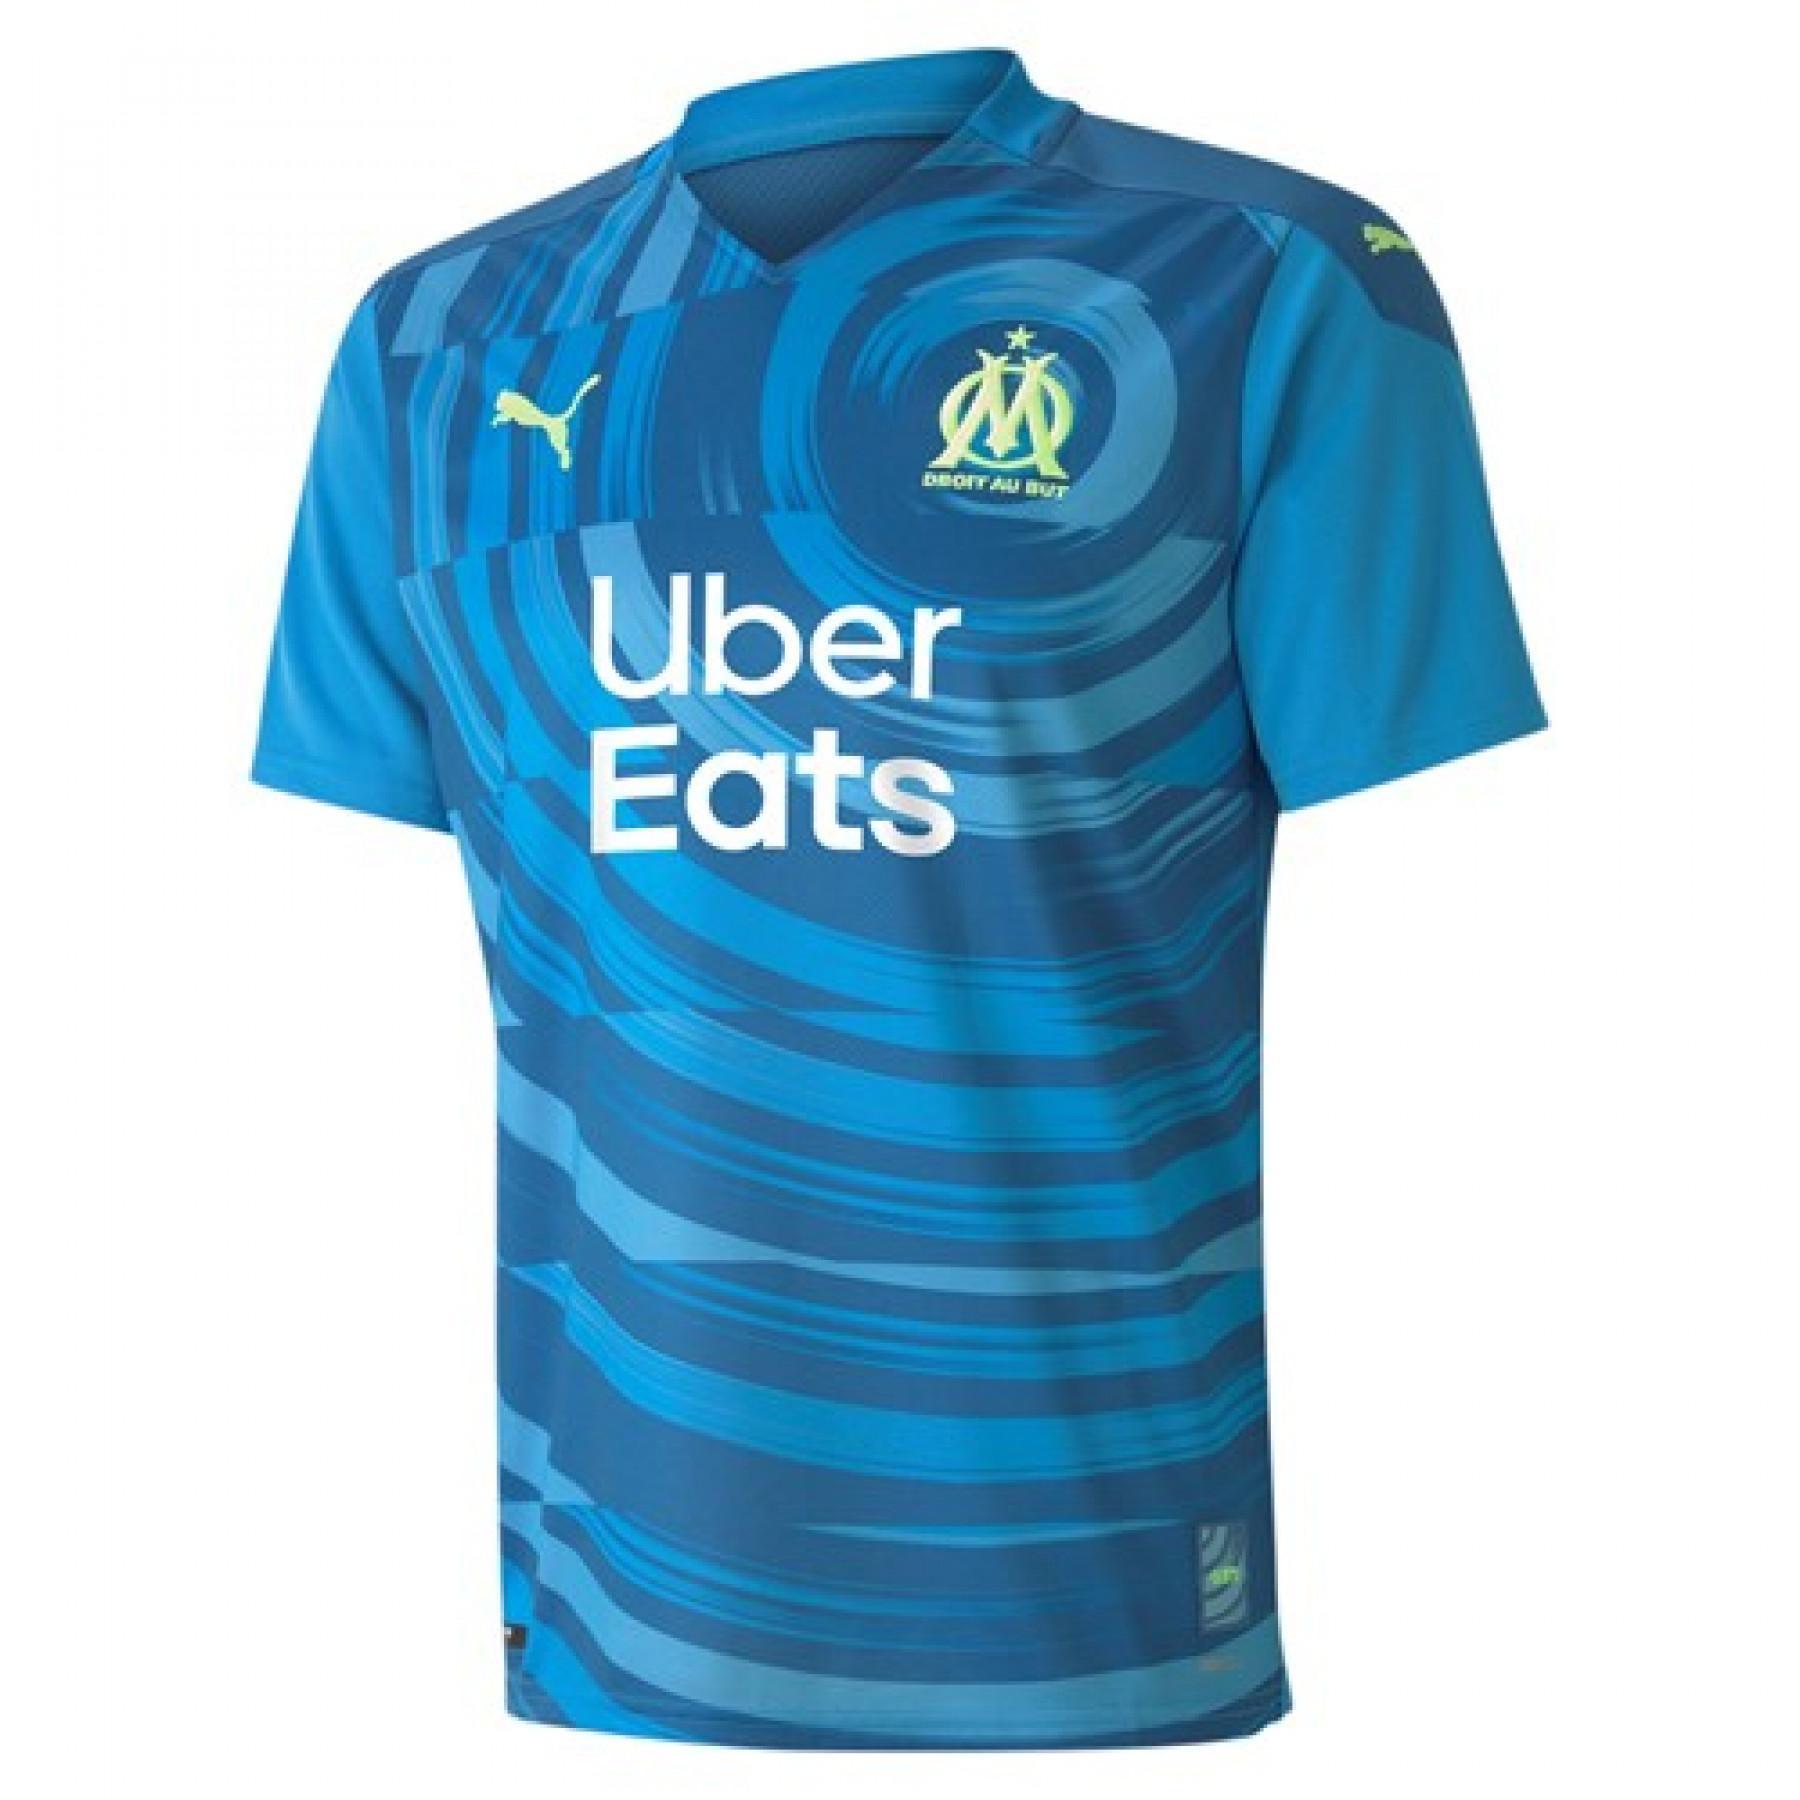 OM 2020/21 third jersey